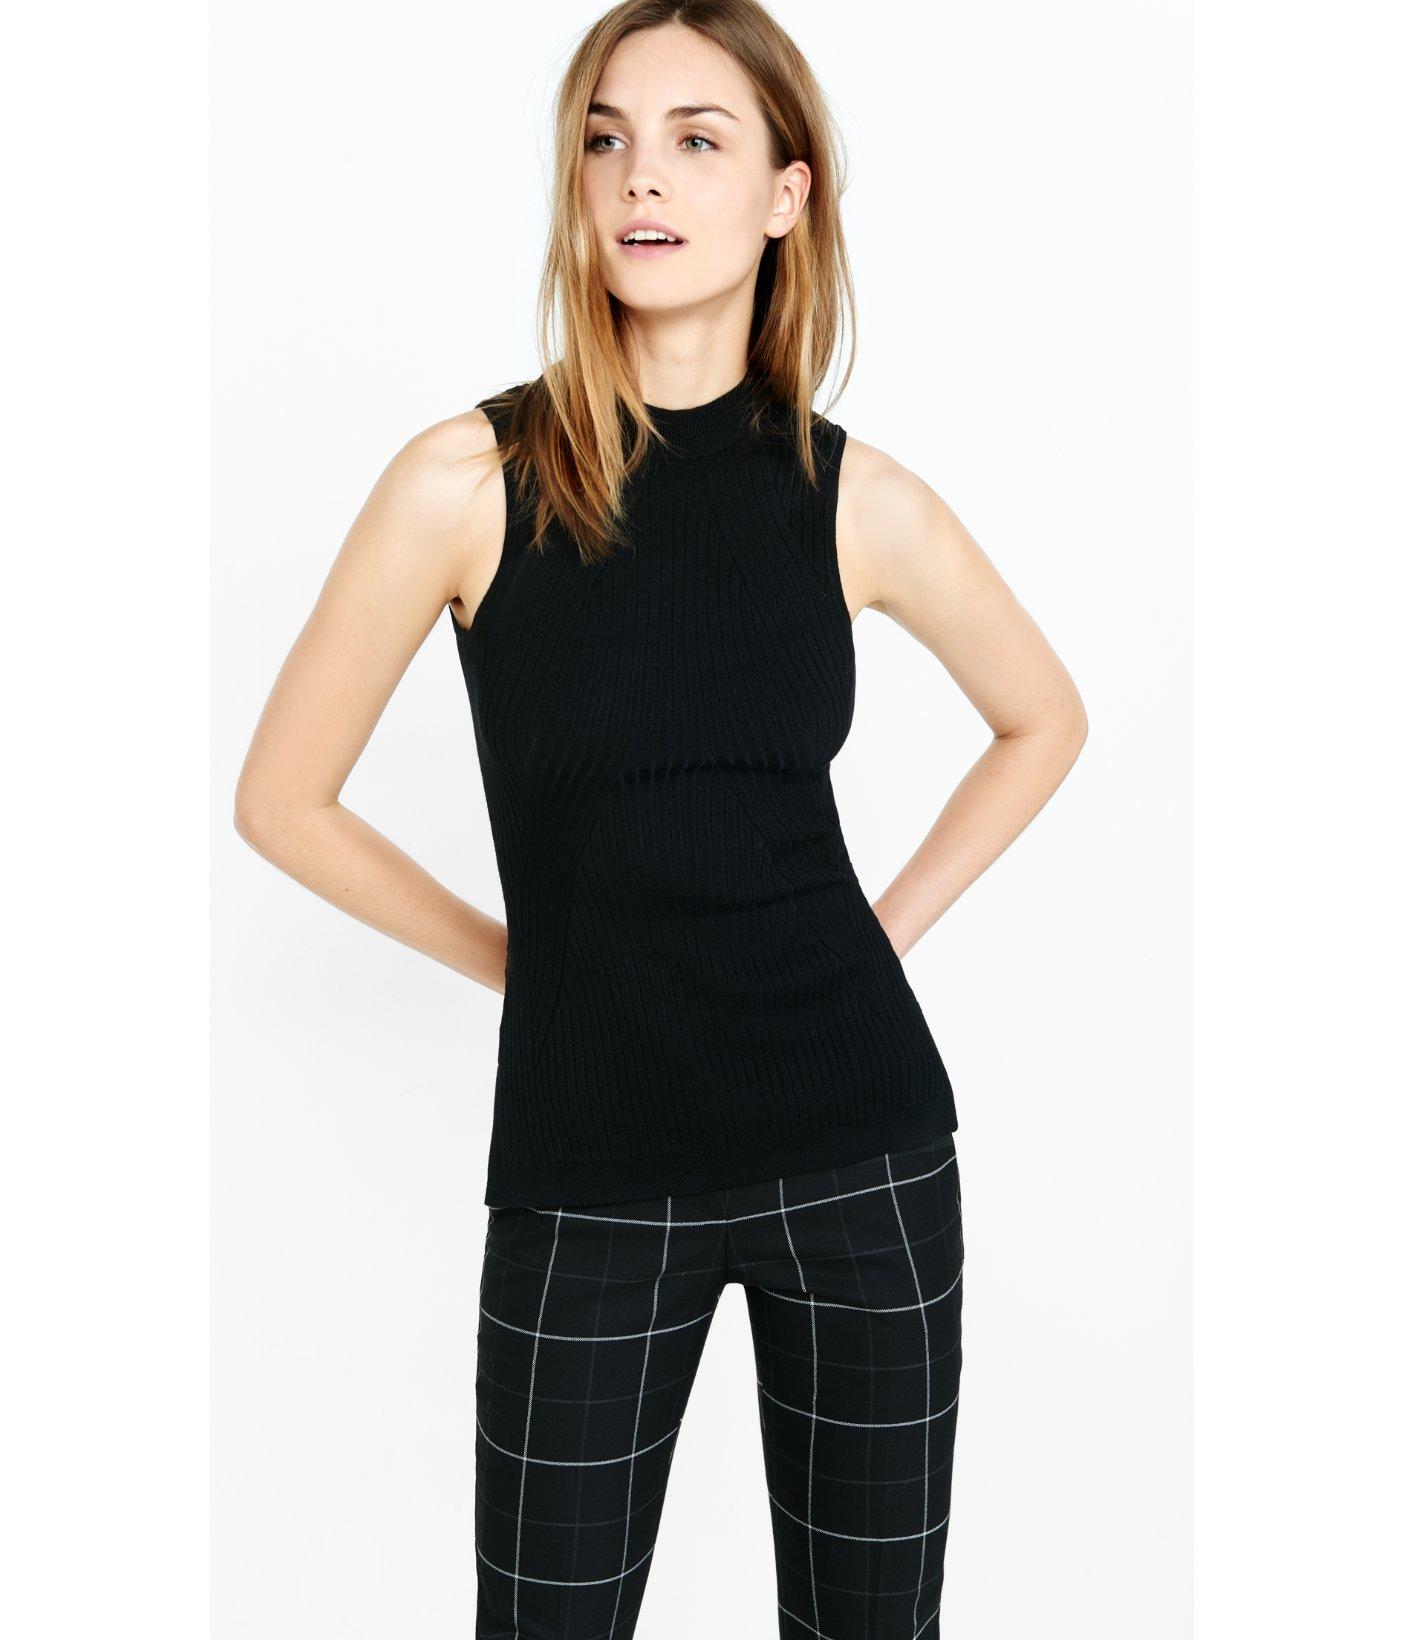 1b57be2524 Lyst - Express Sleeveless Mock Neck Engineered Rib Sweater in Black